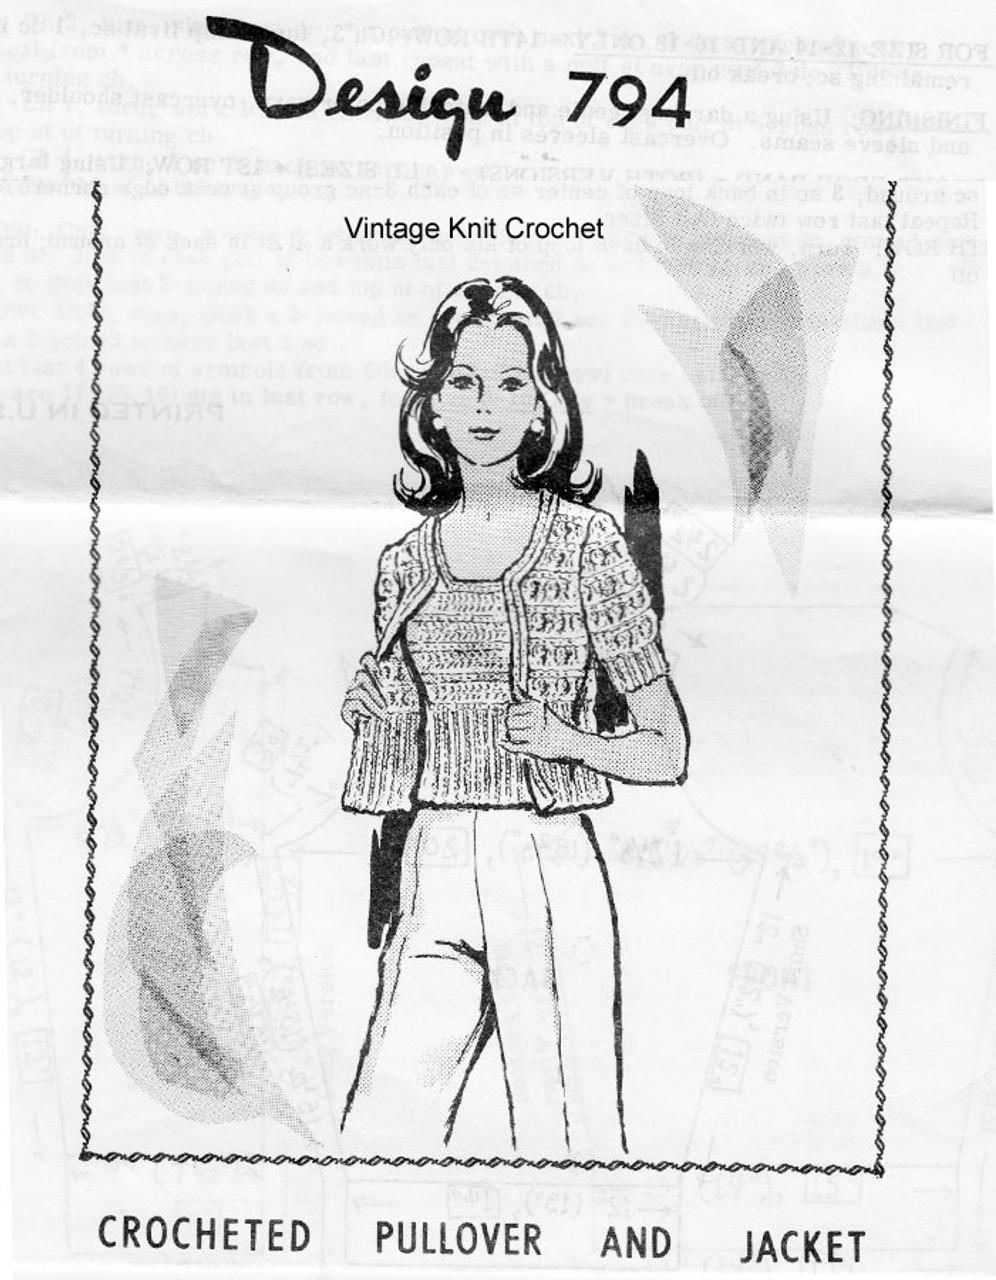 Crochet Sleeveless Top Jacket Pattern Design 794